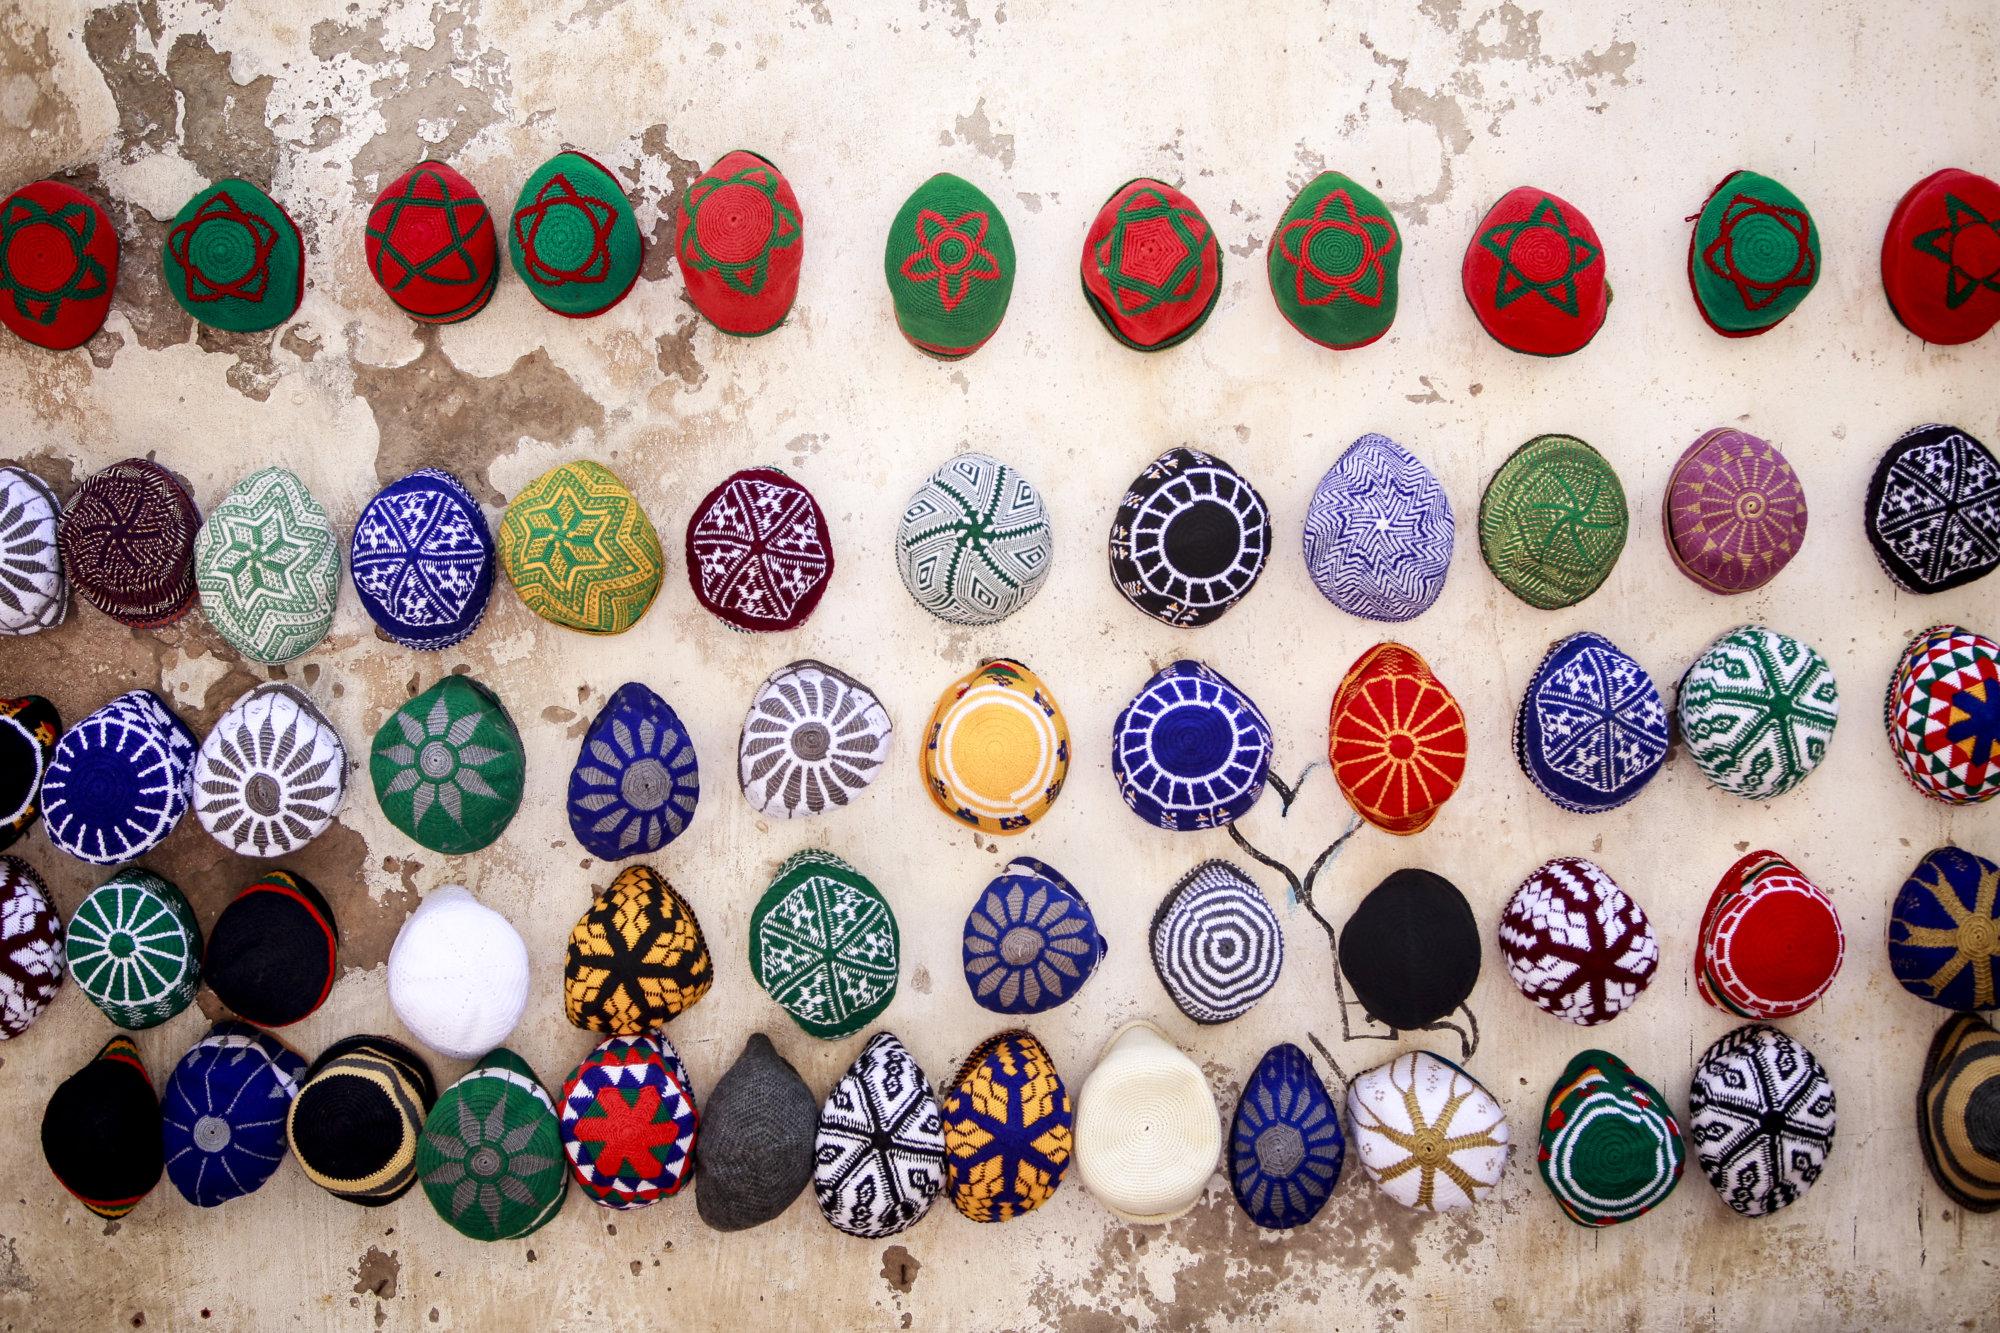 colorful-hats-essaouira-marokko-2016-mcu-ausflug